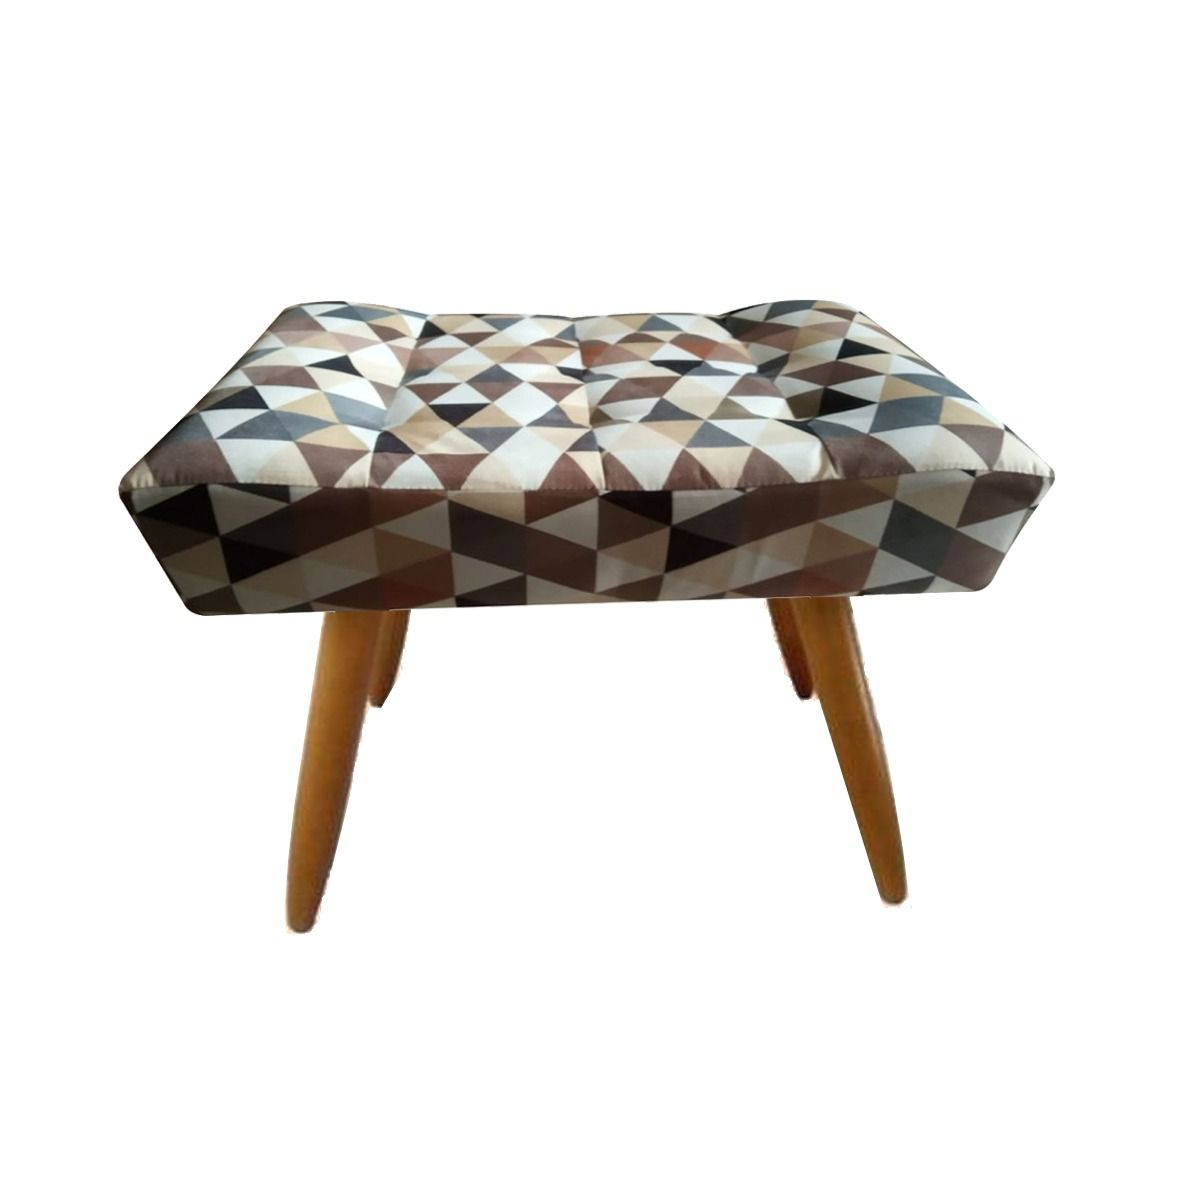 Kit 02 Poltrona Decorativa Nina com e Puff retangular Triângulos Bege - Bela Casa Shop